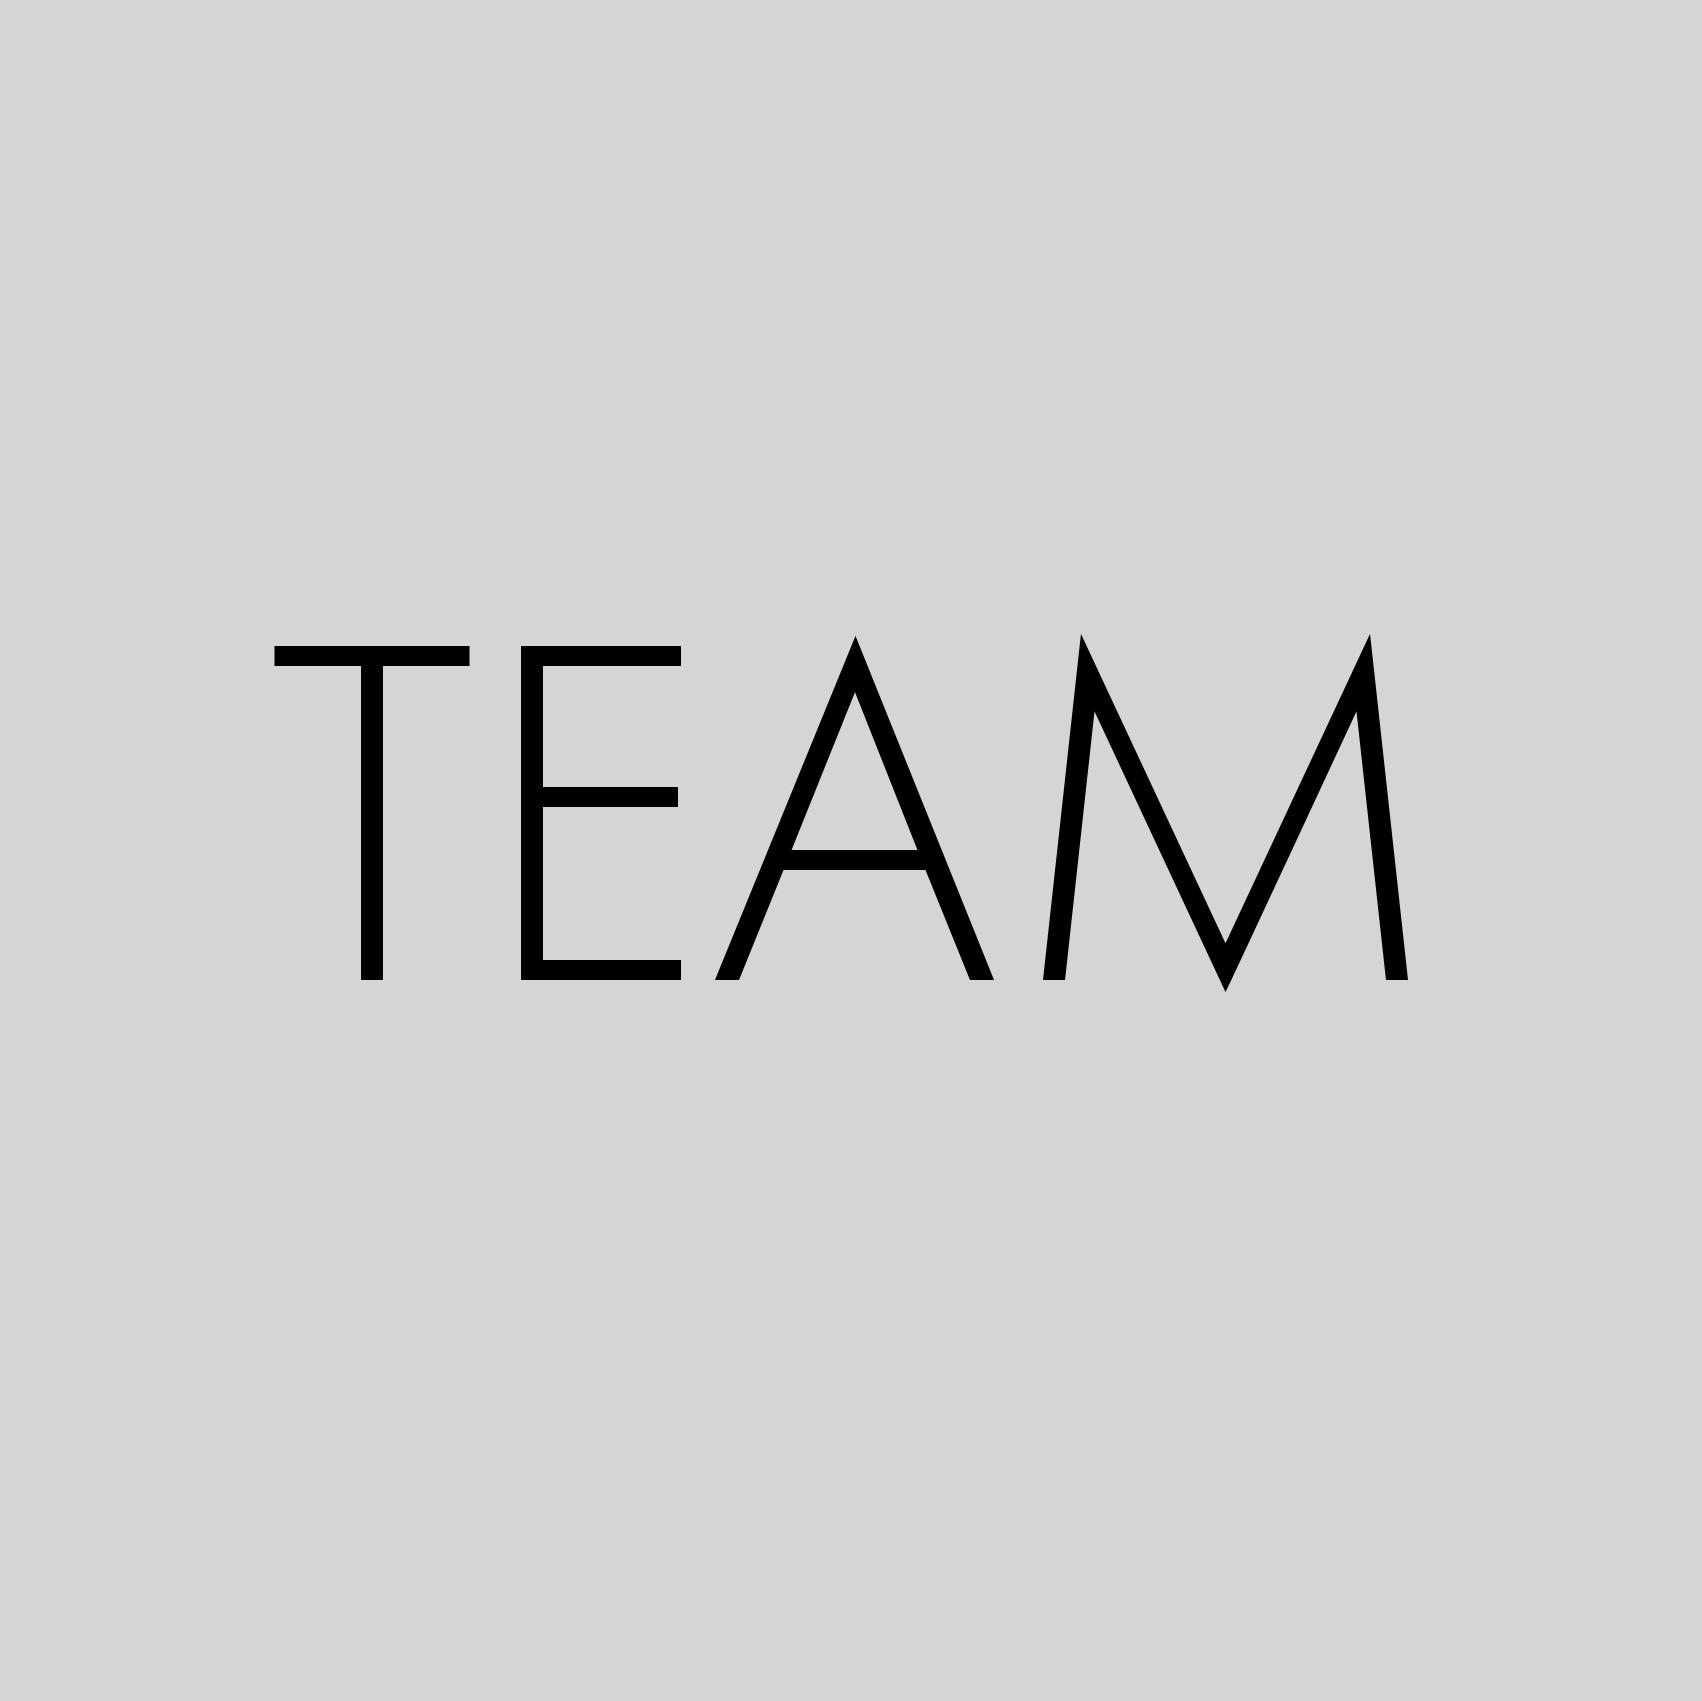 team2.jpg